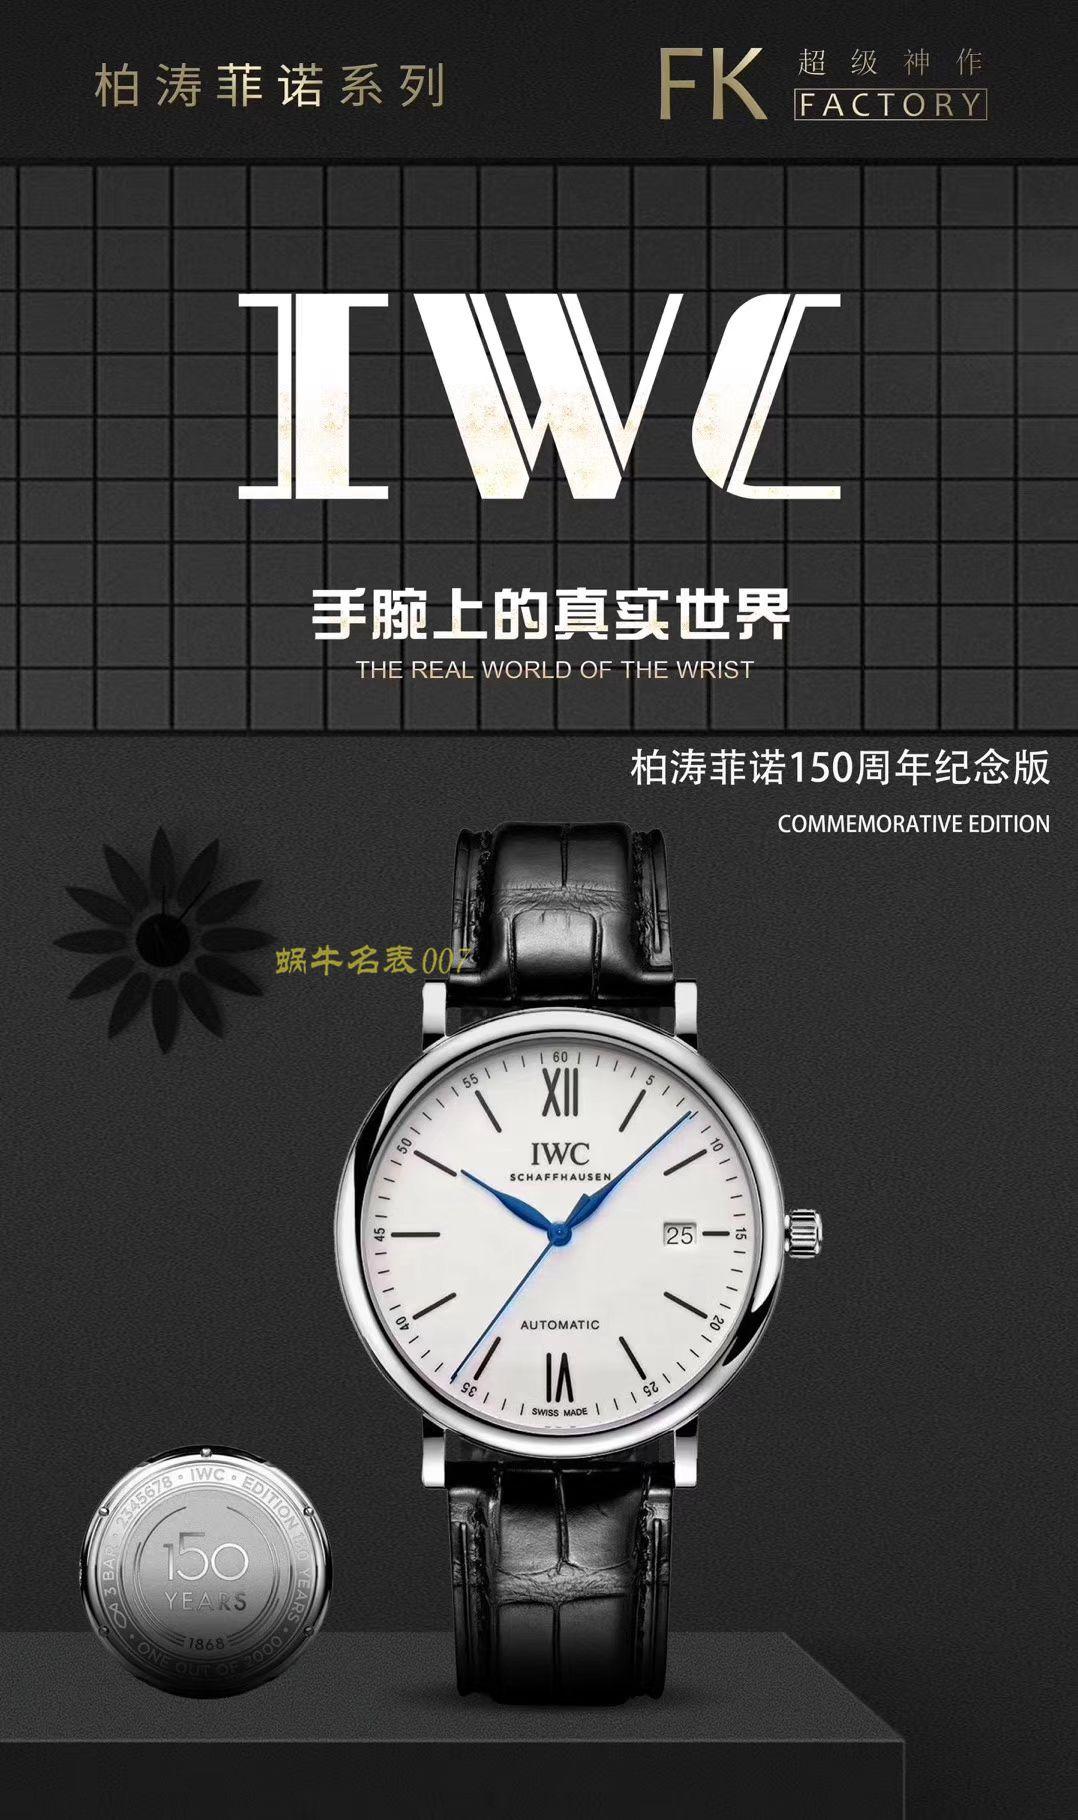 万国表柏涛菲诺系列IW356501、IW356304、IW356505、IW356511、IW356517、W356512腕表【FK一比一高仿复制】